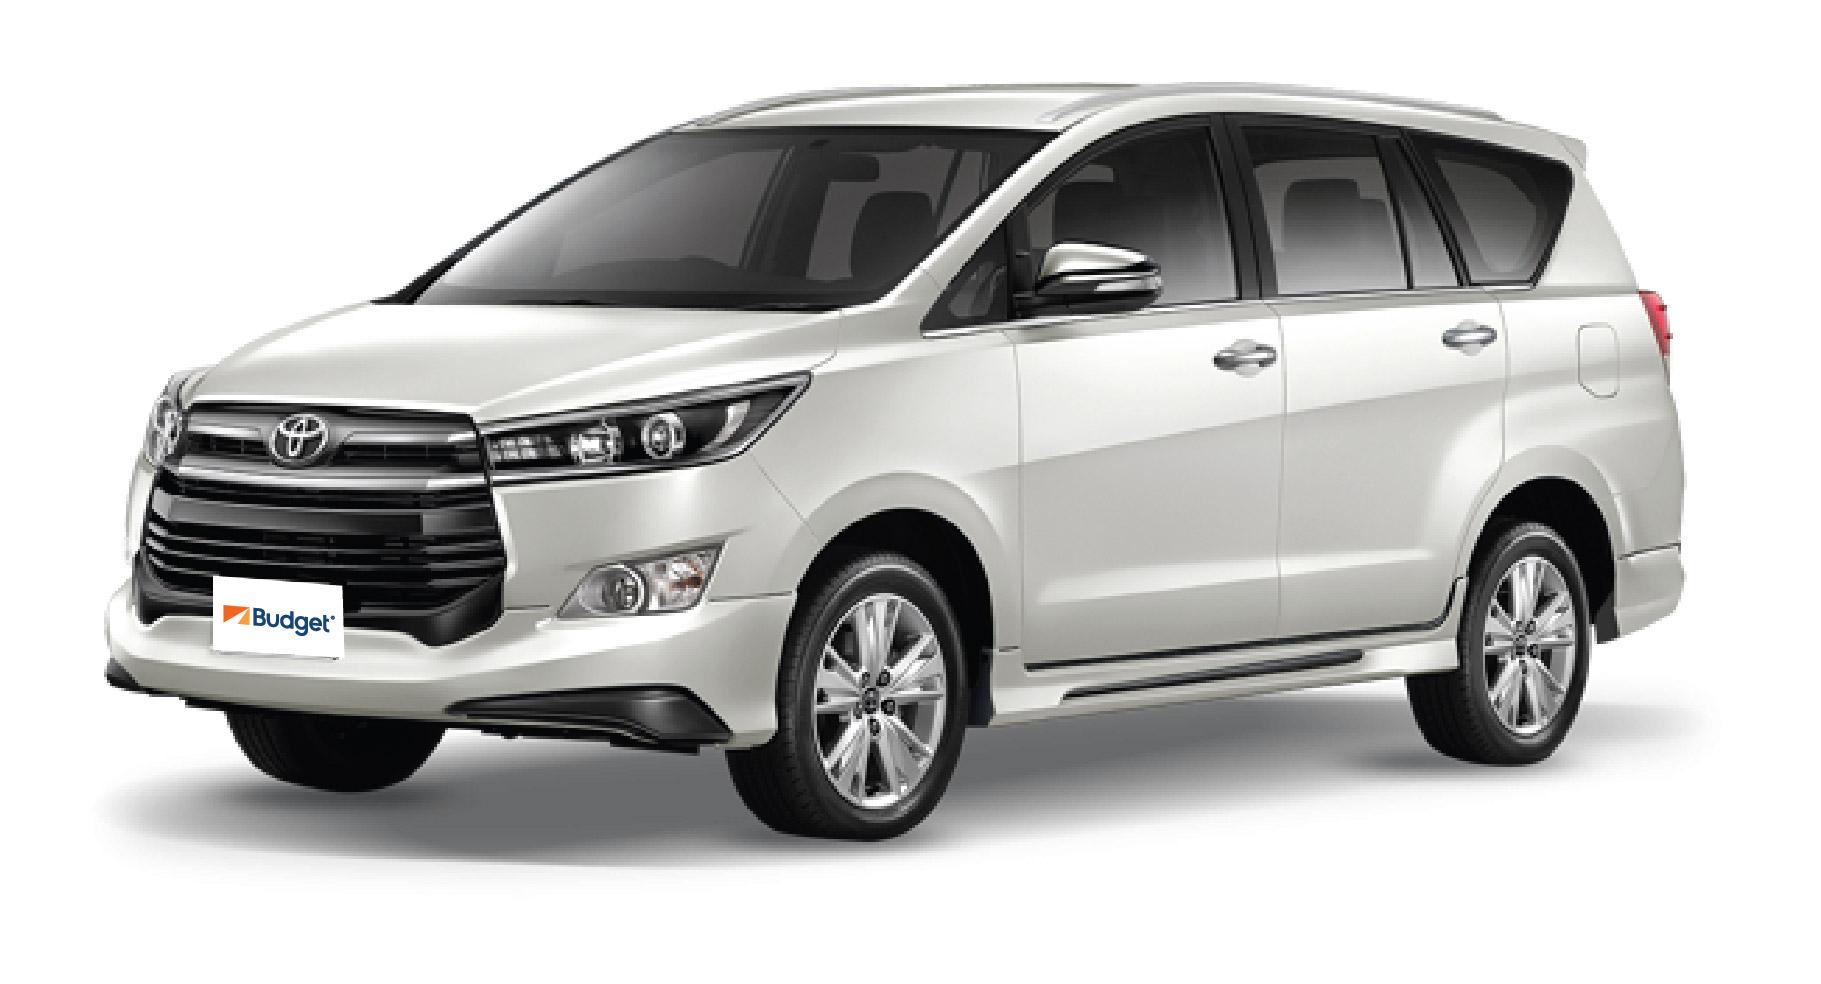 Toyota Innova or similar